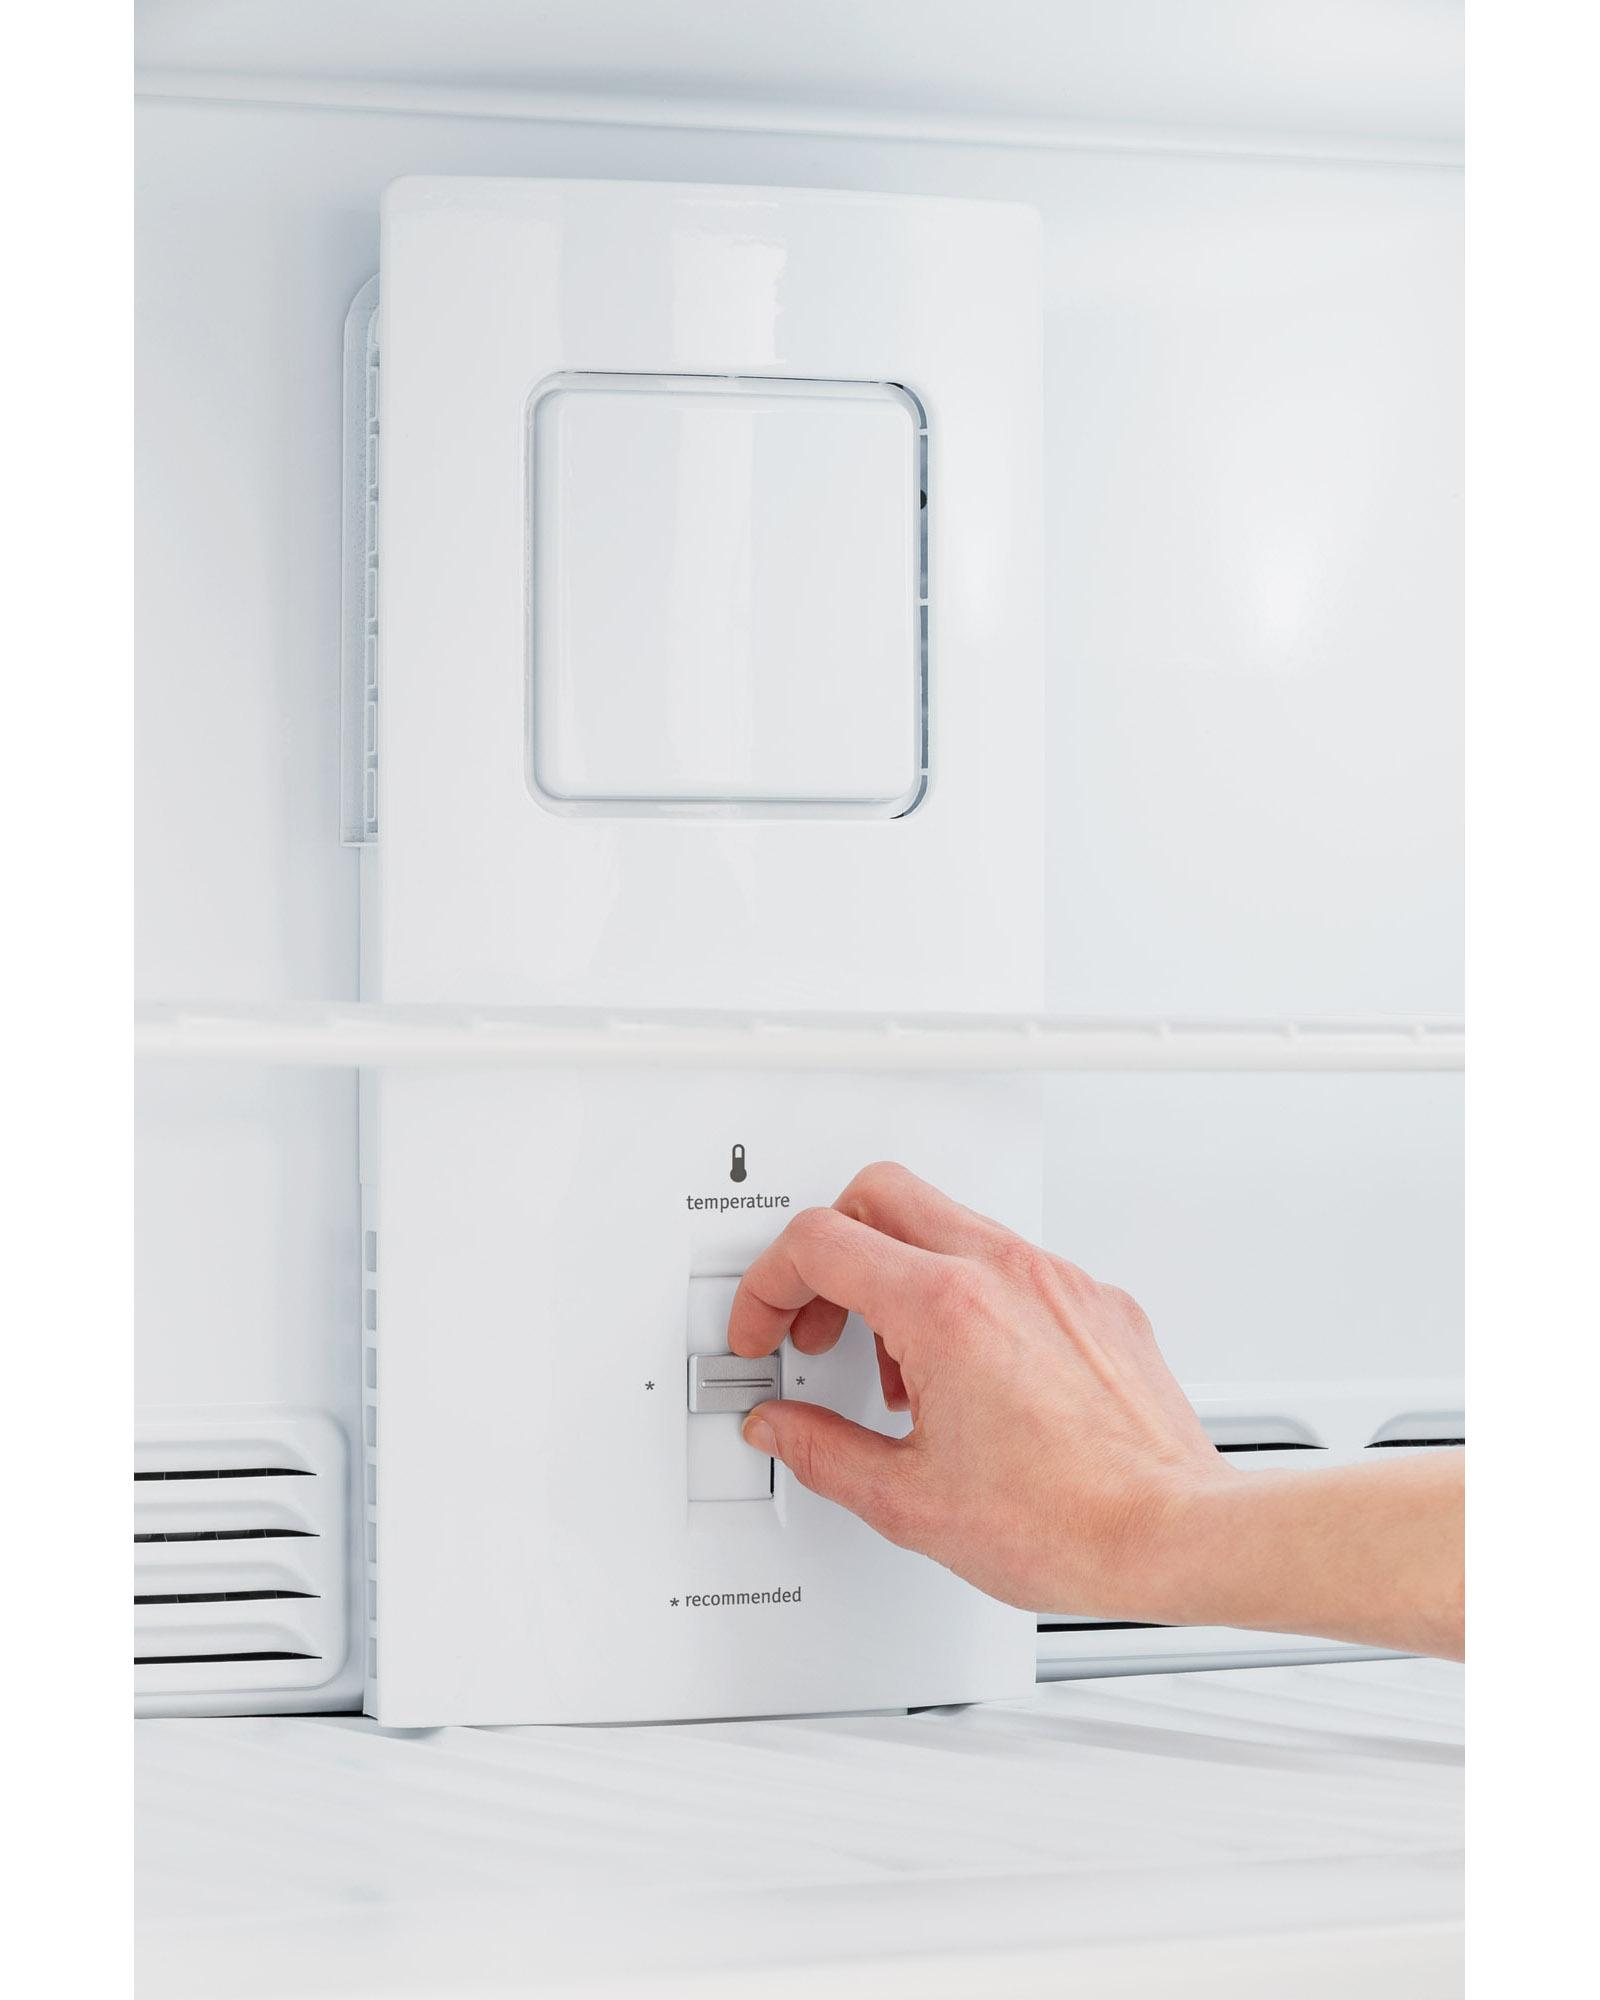 Frigidaire FFHT1821QB 18 cu. ft. Top Freezer Refrigerator - Black